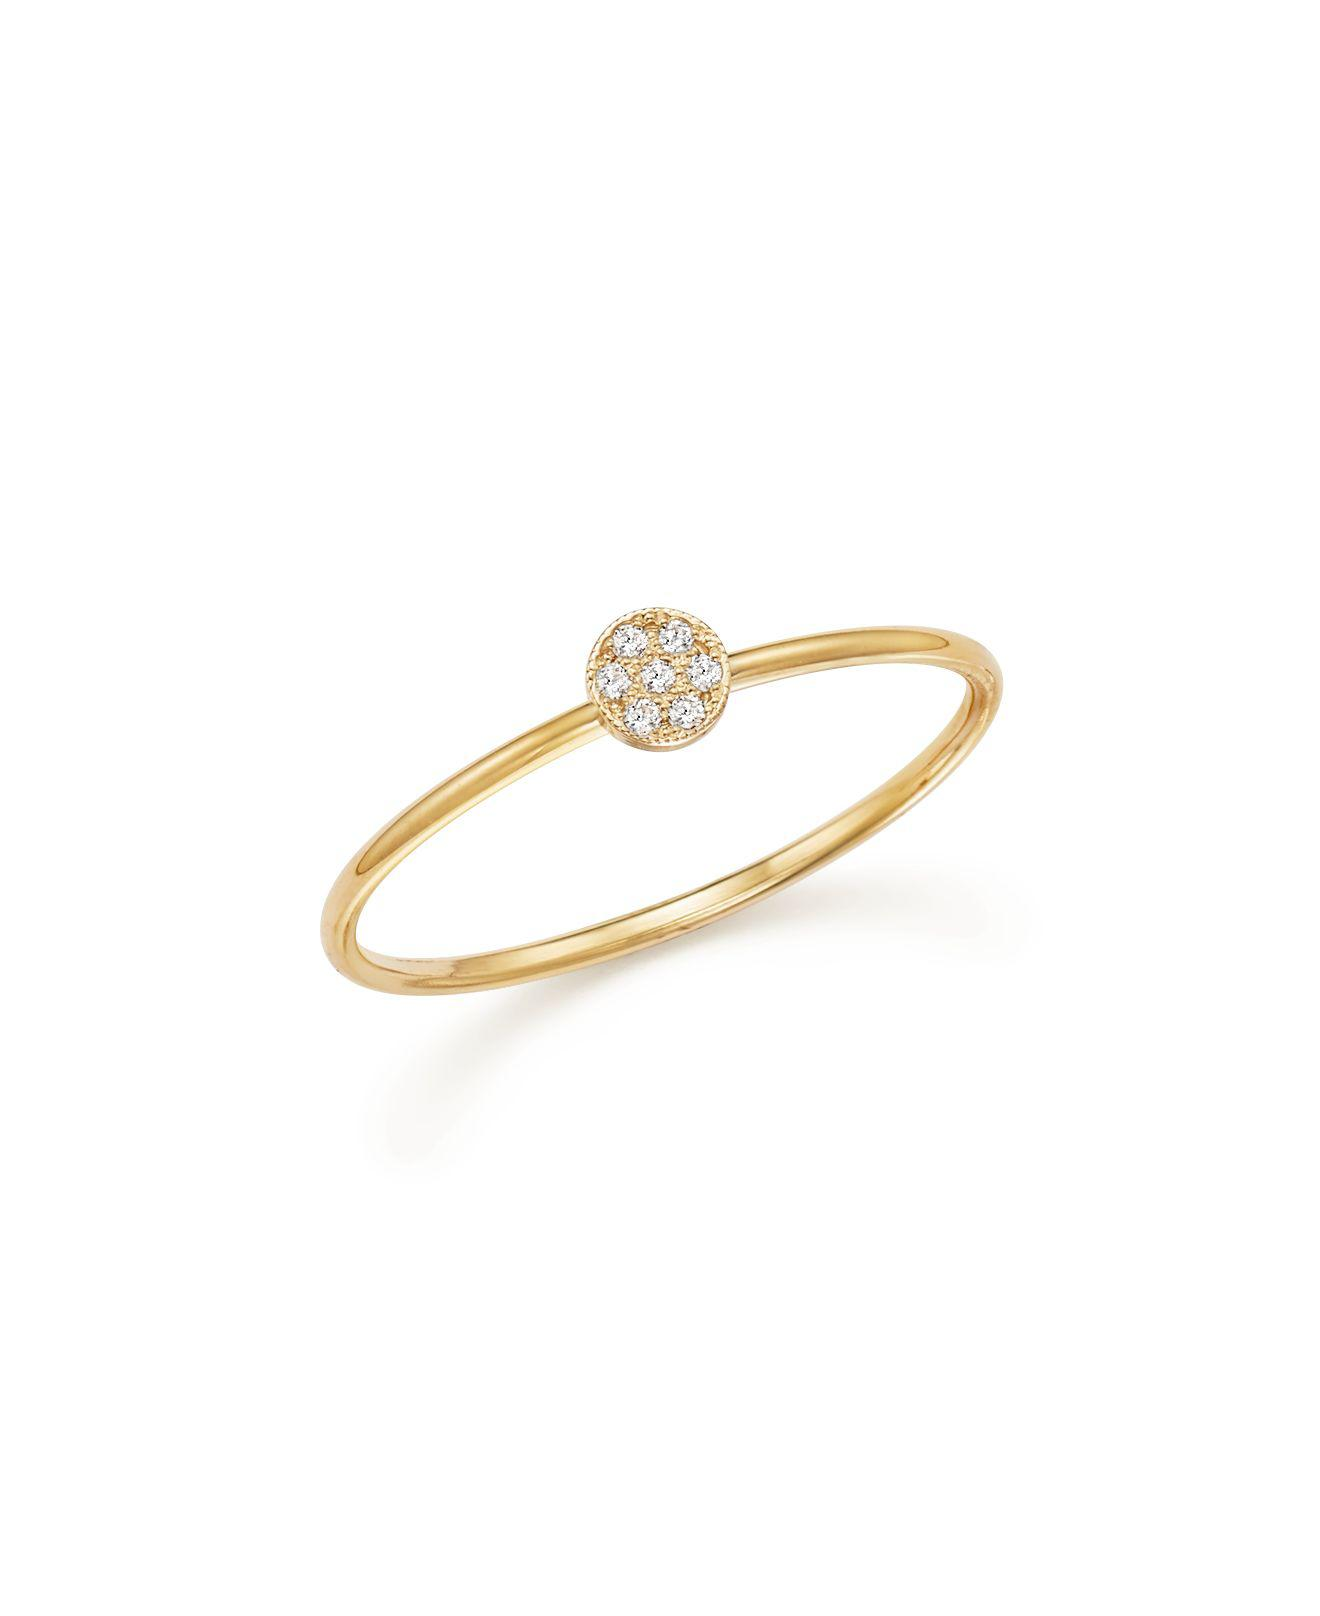 Zoë Chicco 14k Prong Diamond Wrap Ring SVD15inOz